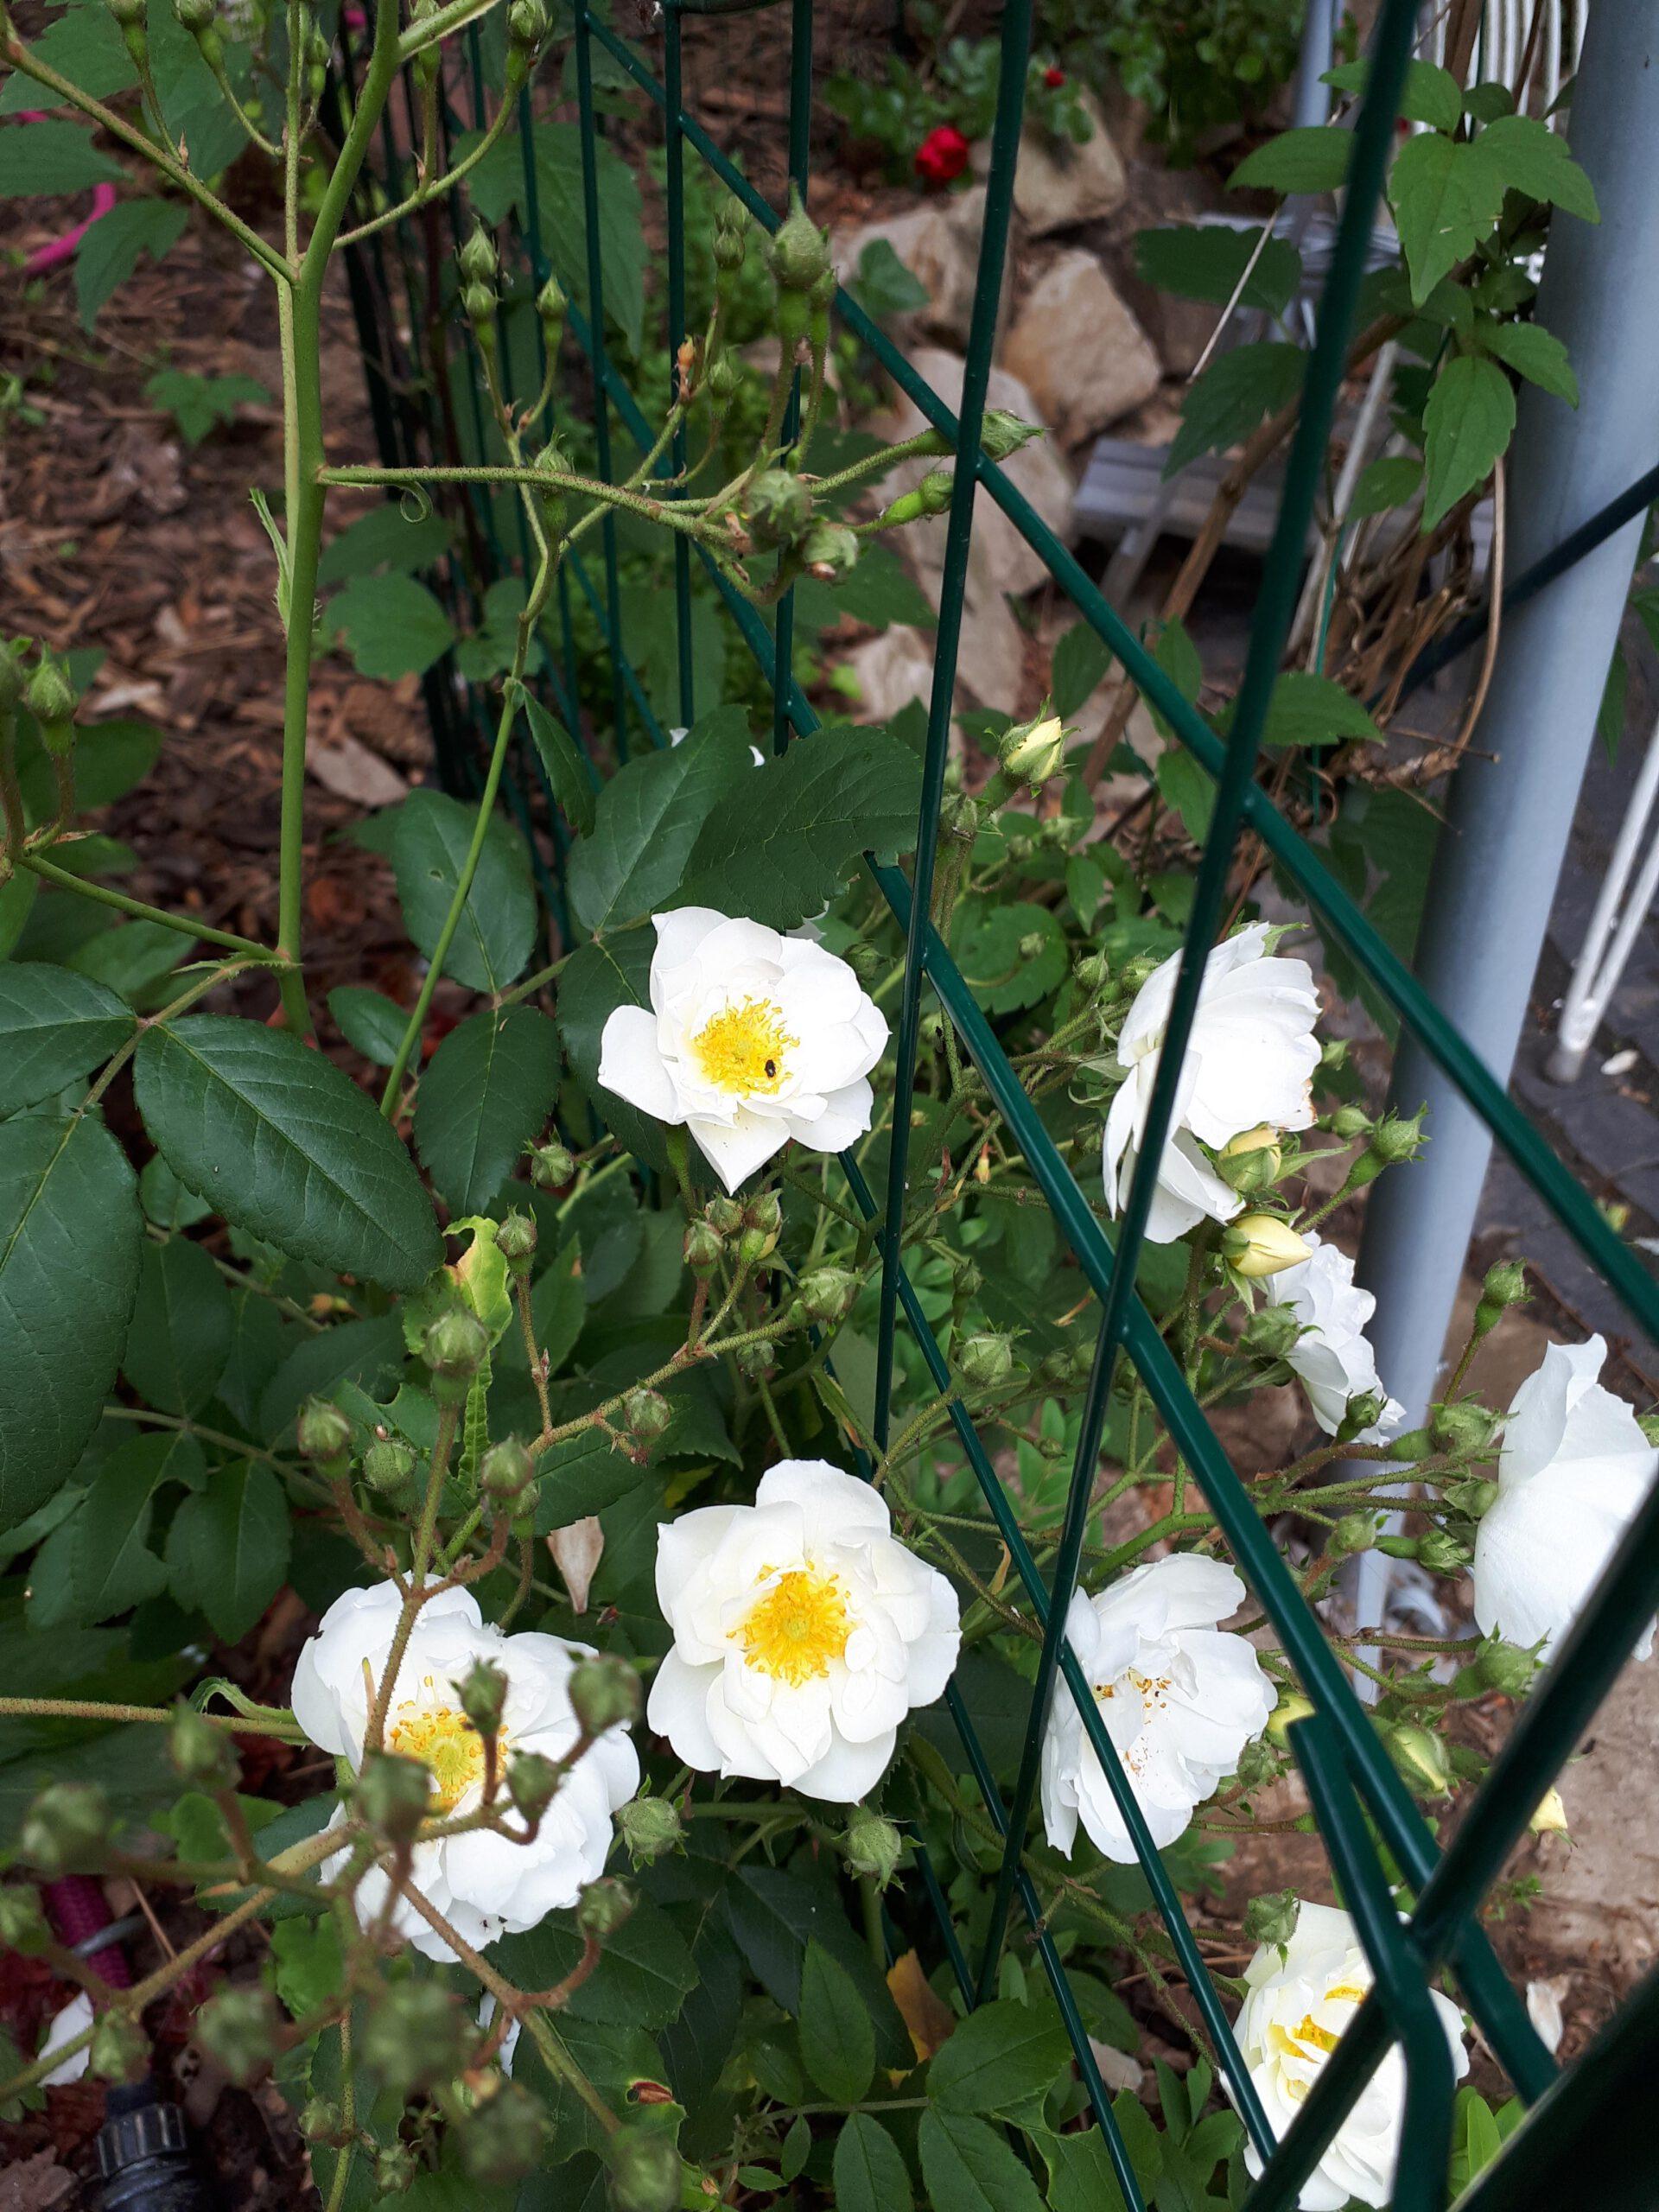 Meine Rosensorten, hier der Rambler Rambling Rector der den Rosenpavillon beranken soll.